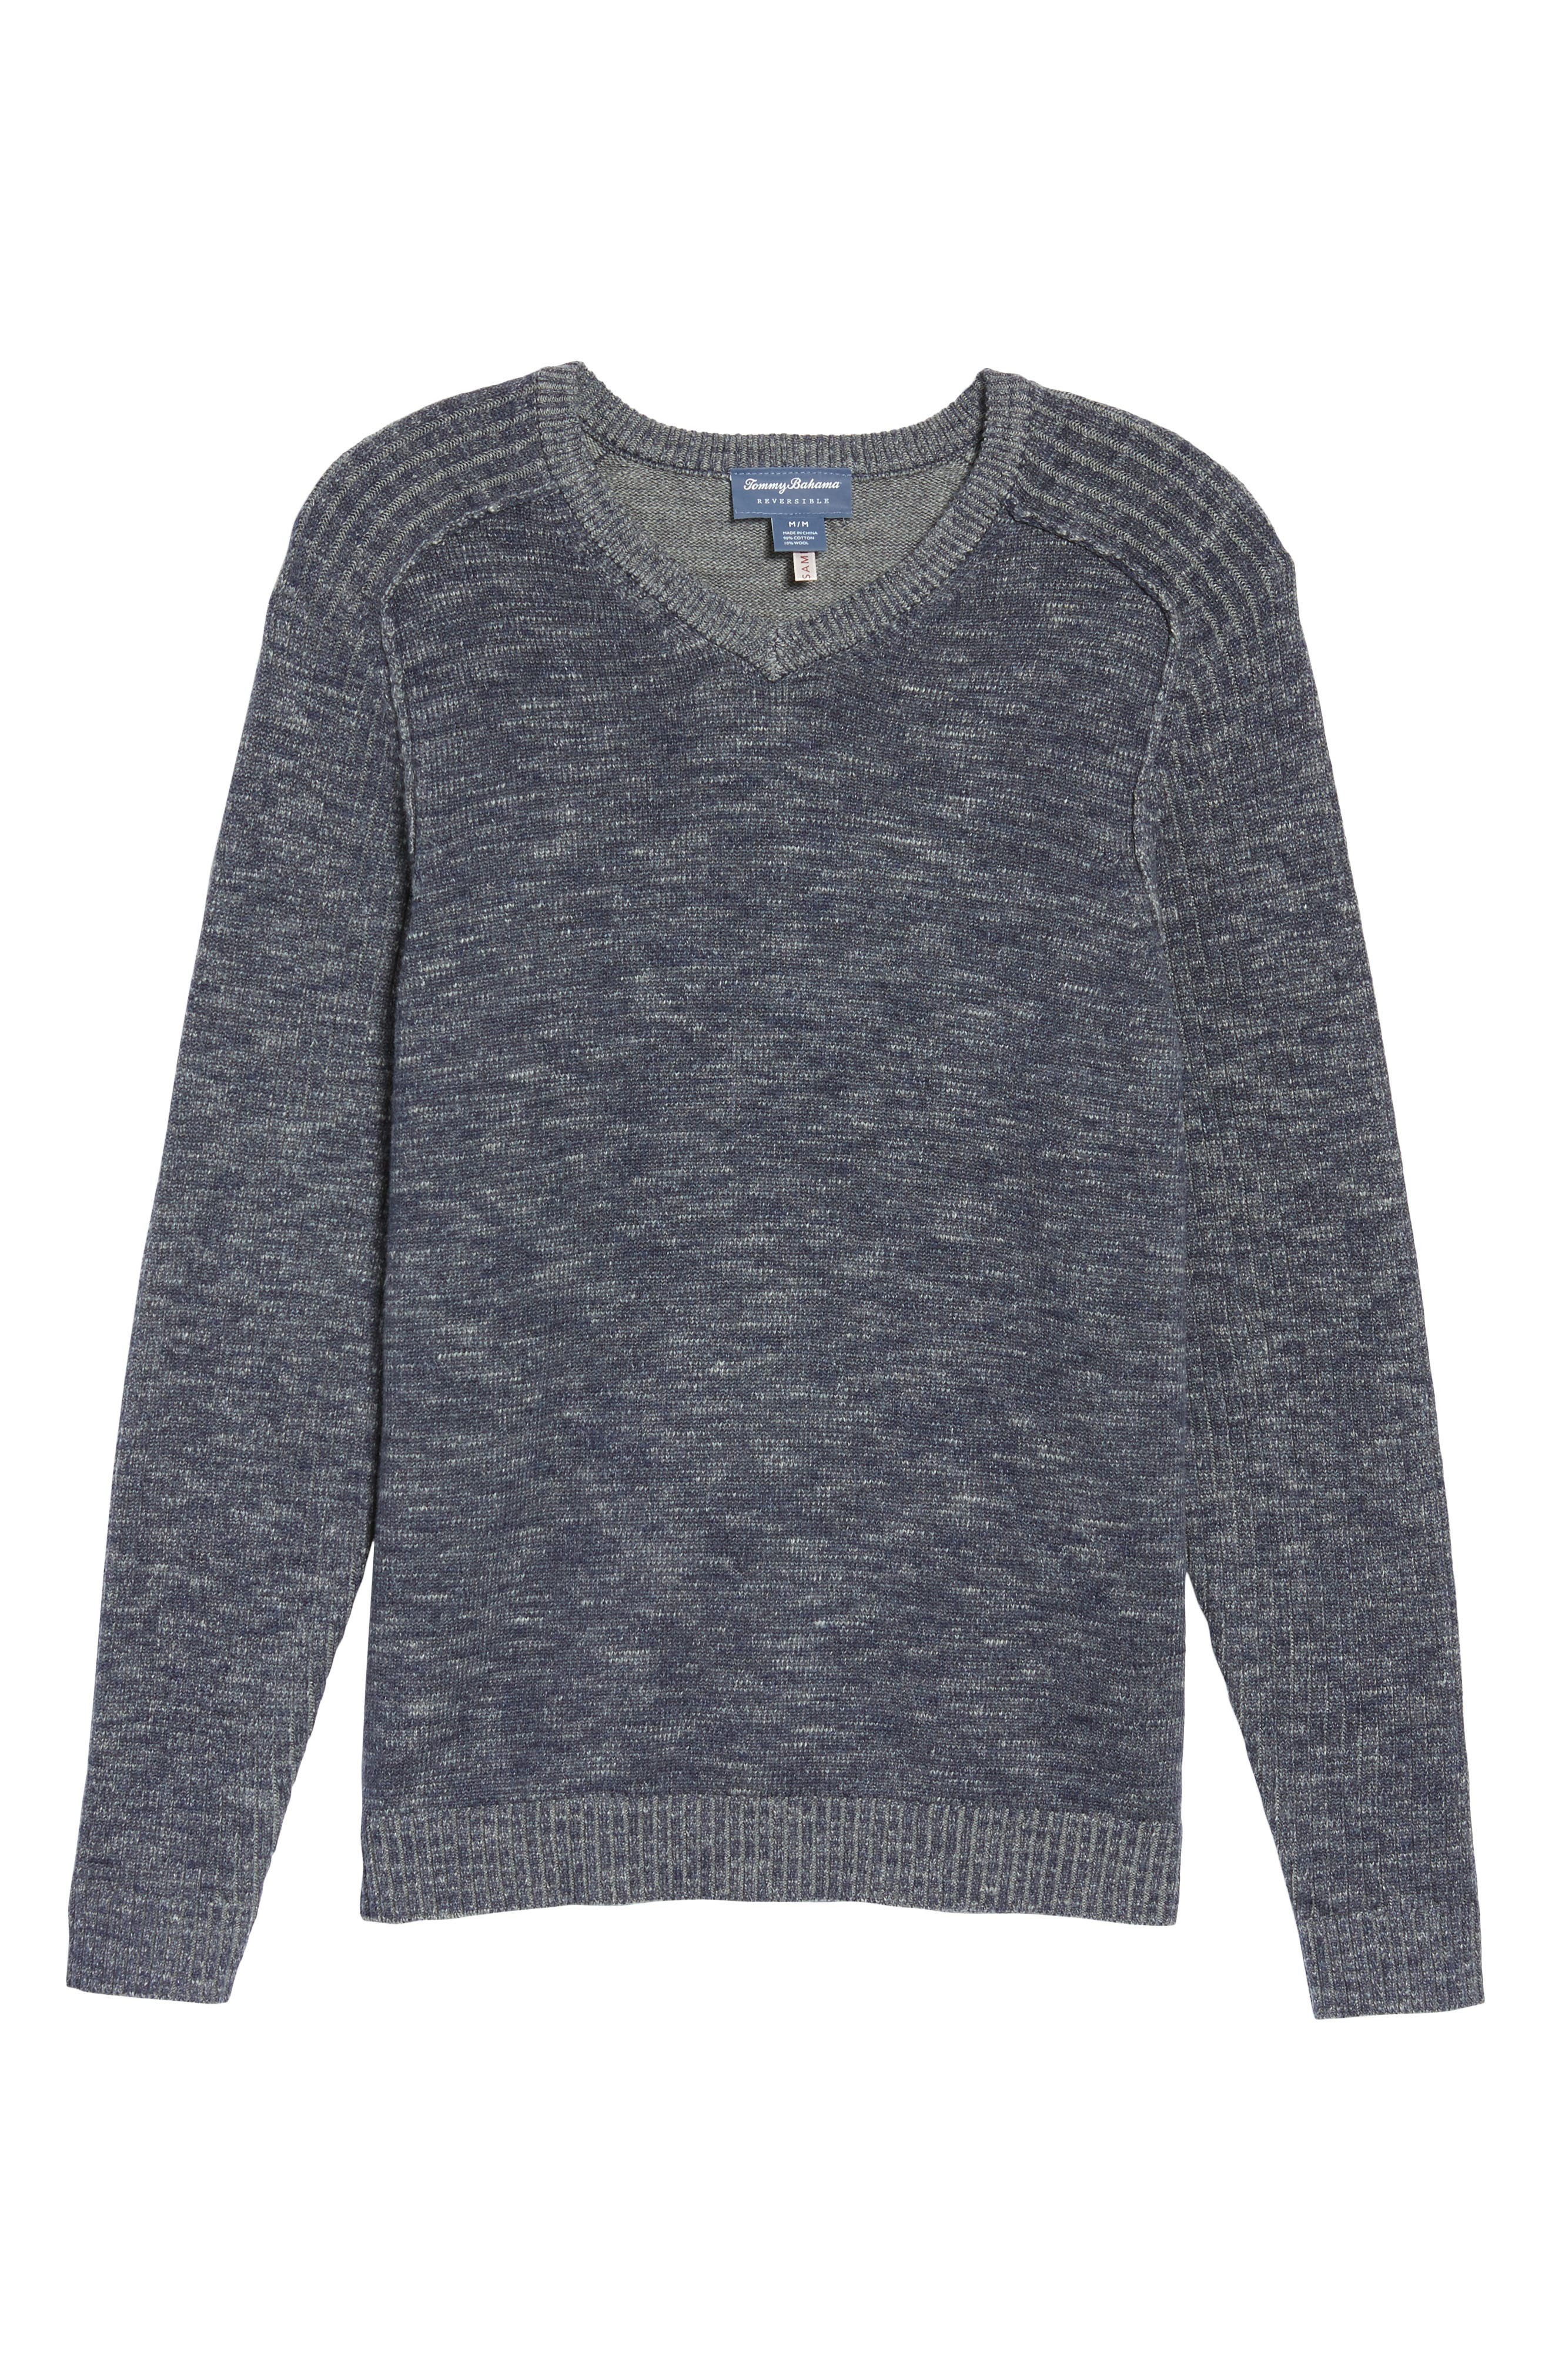 Gran Rey Flip Reversible Cotton & Wool Sweater,                             Alternate thumbnail 5, color,                             Ocean Deep Heather